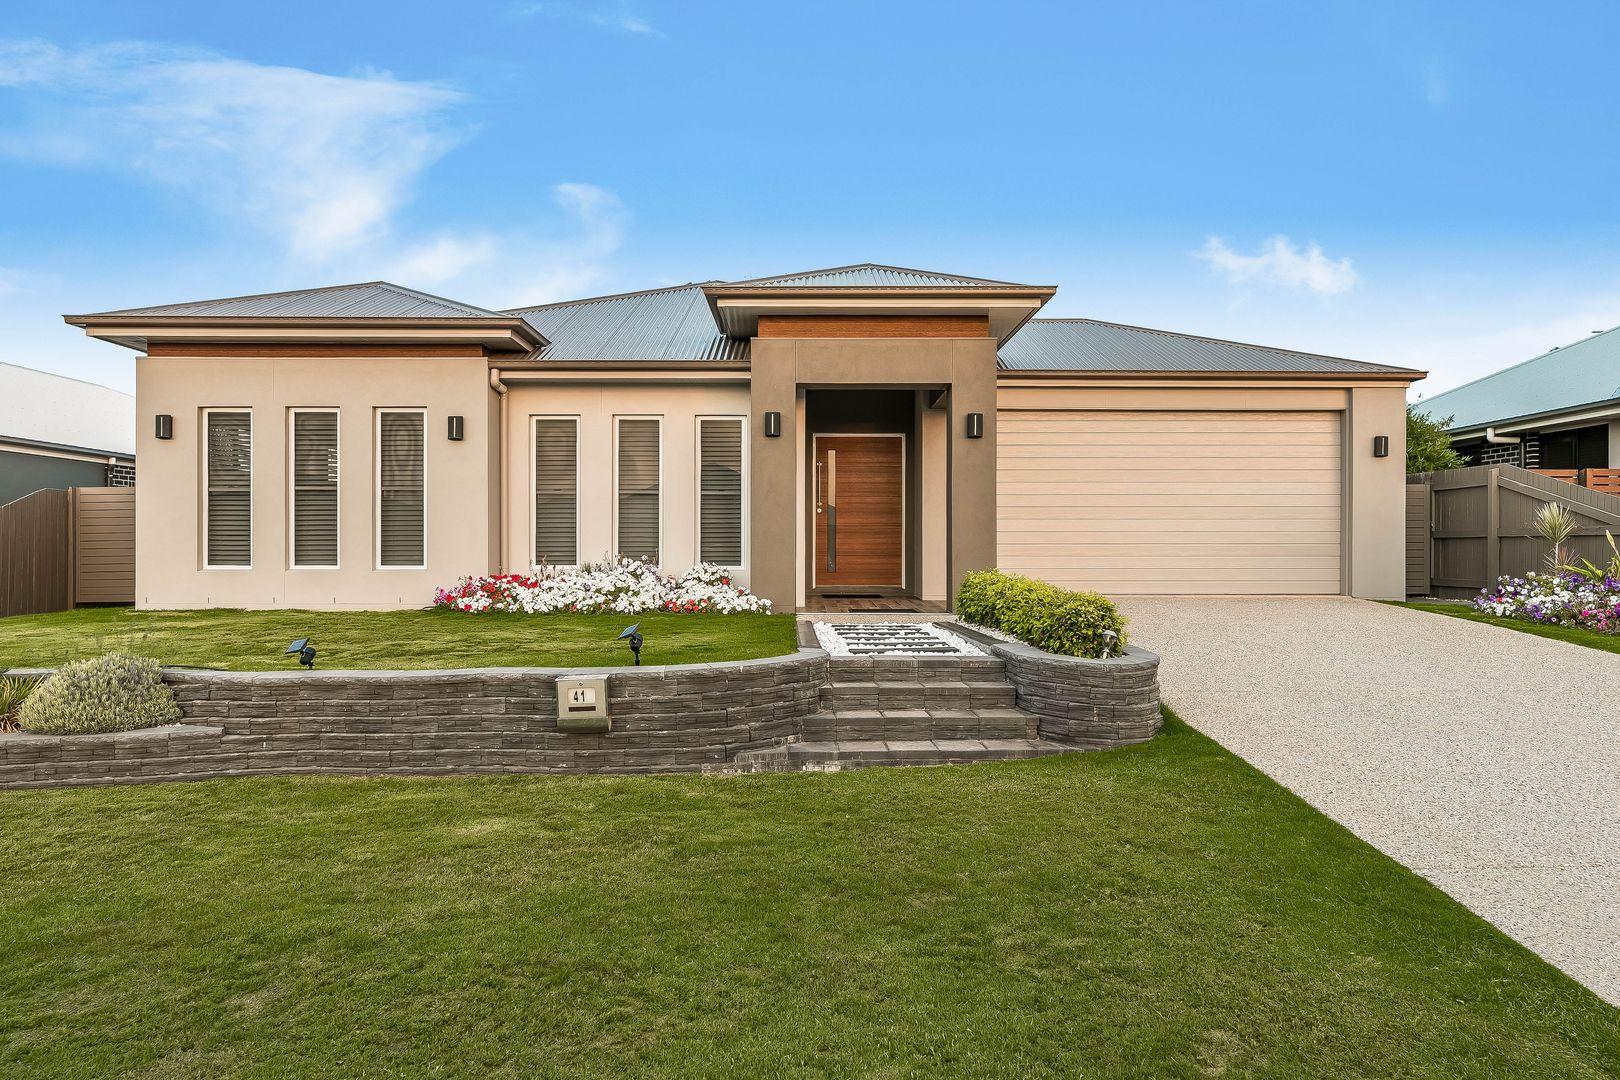 41 Calypso Crescent, Middle Ridge QLD 4350, Image 0